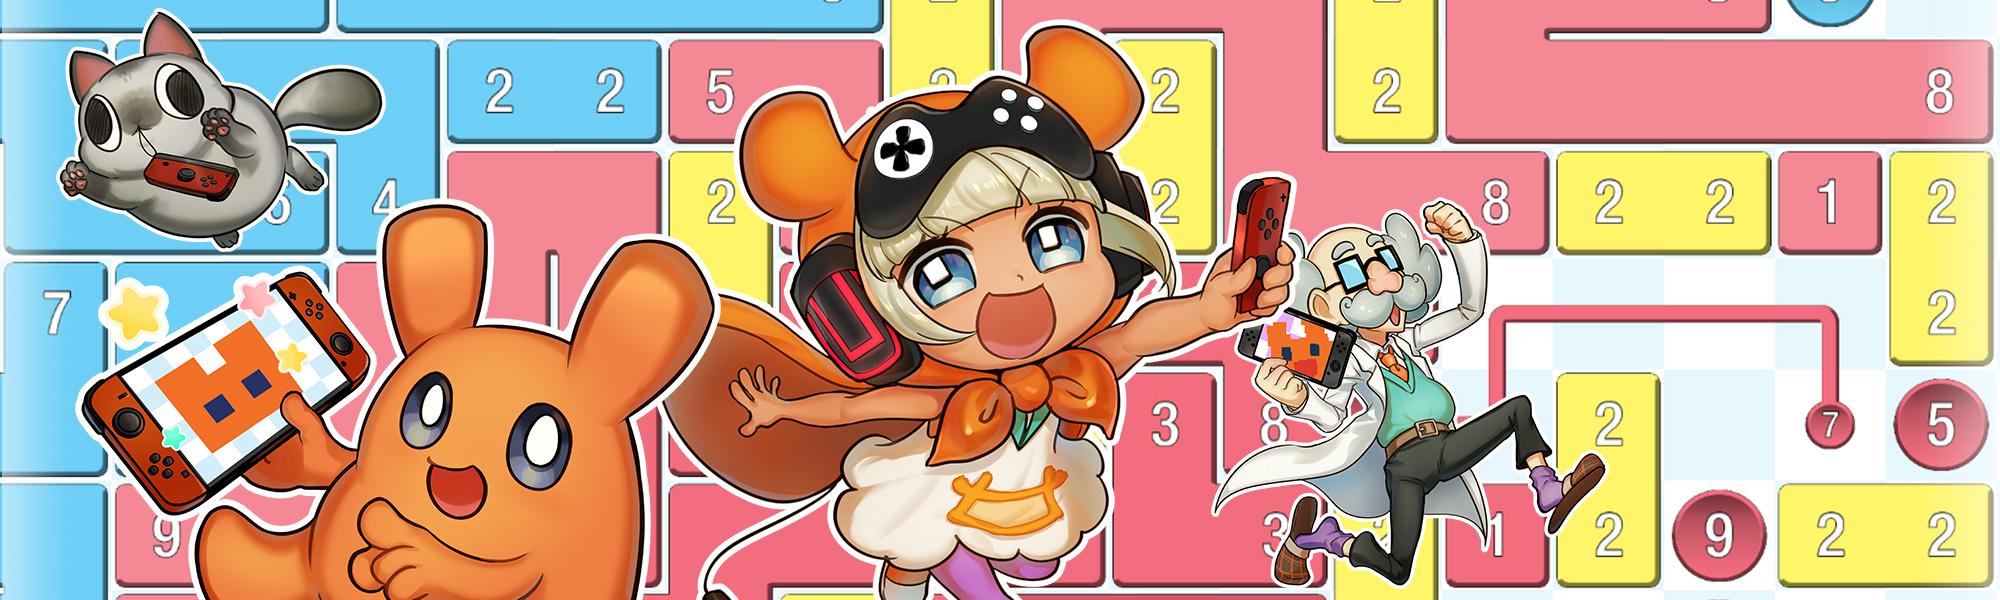 Nintendolife_banner.jpg